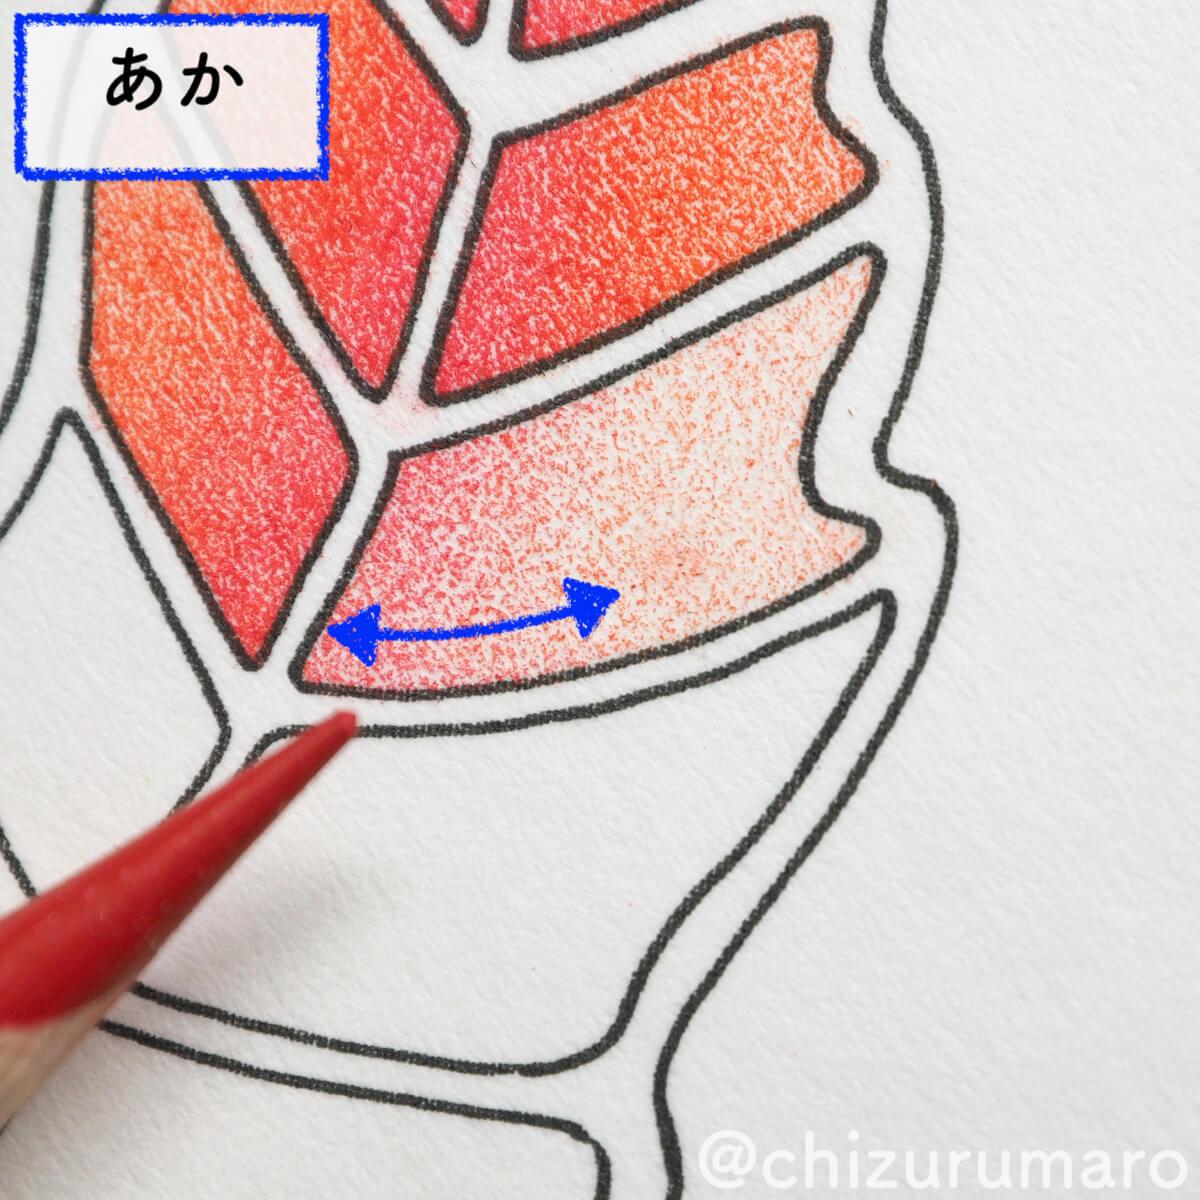 f:id:chizurumaro:20200603122130j:plain